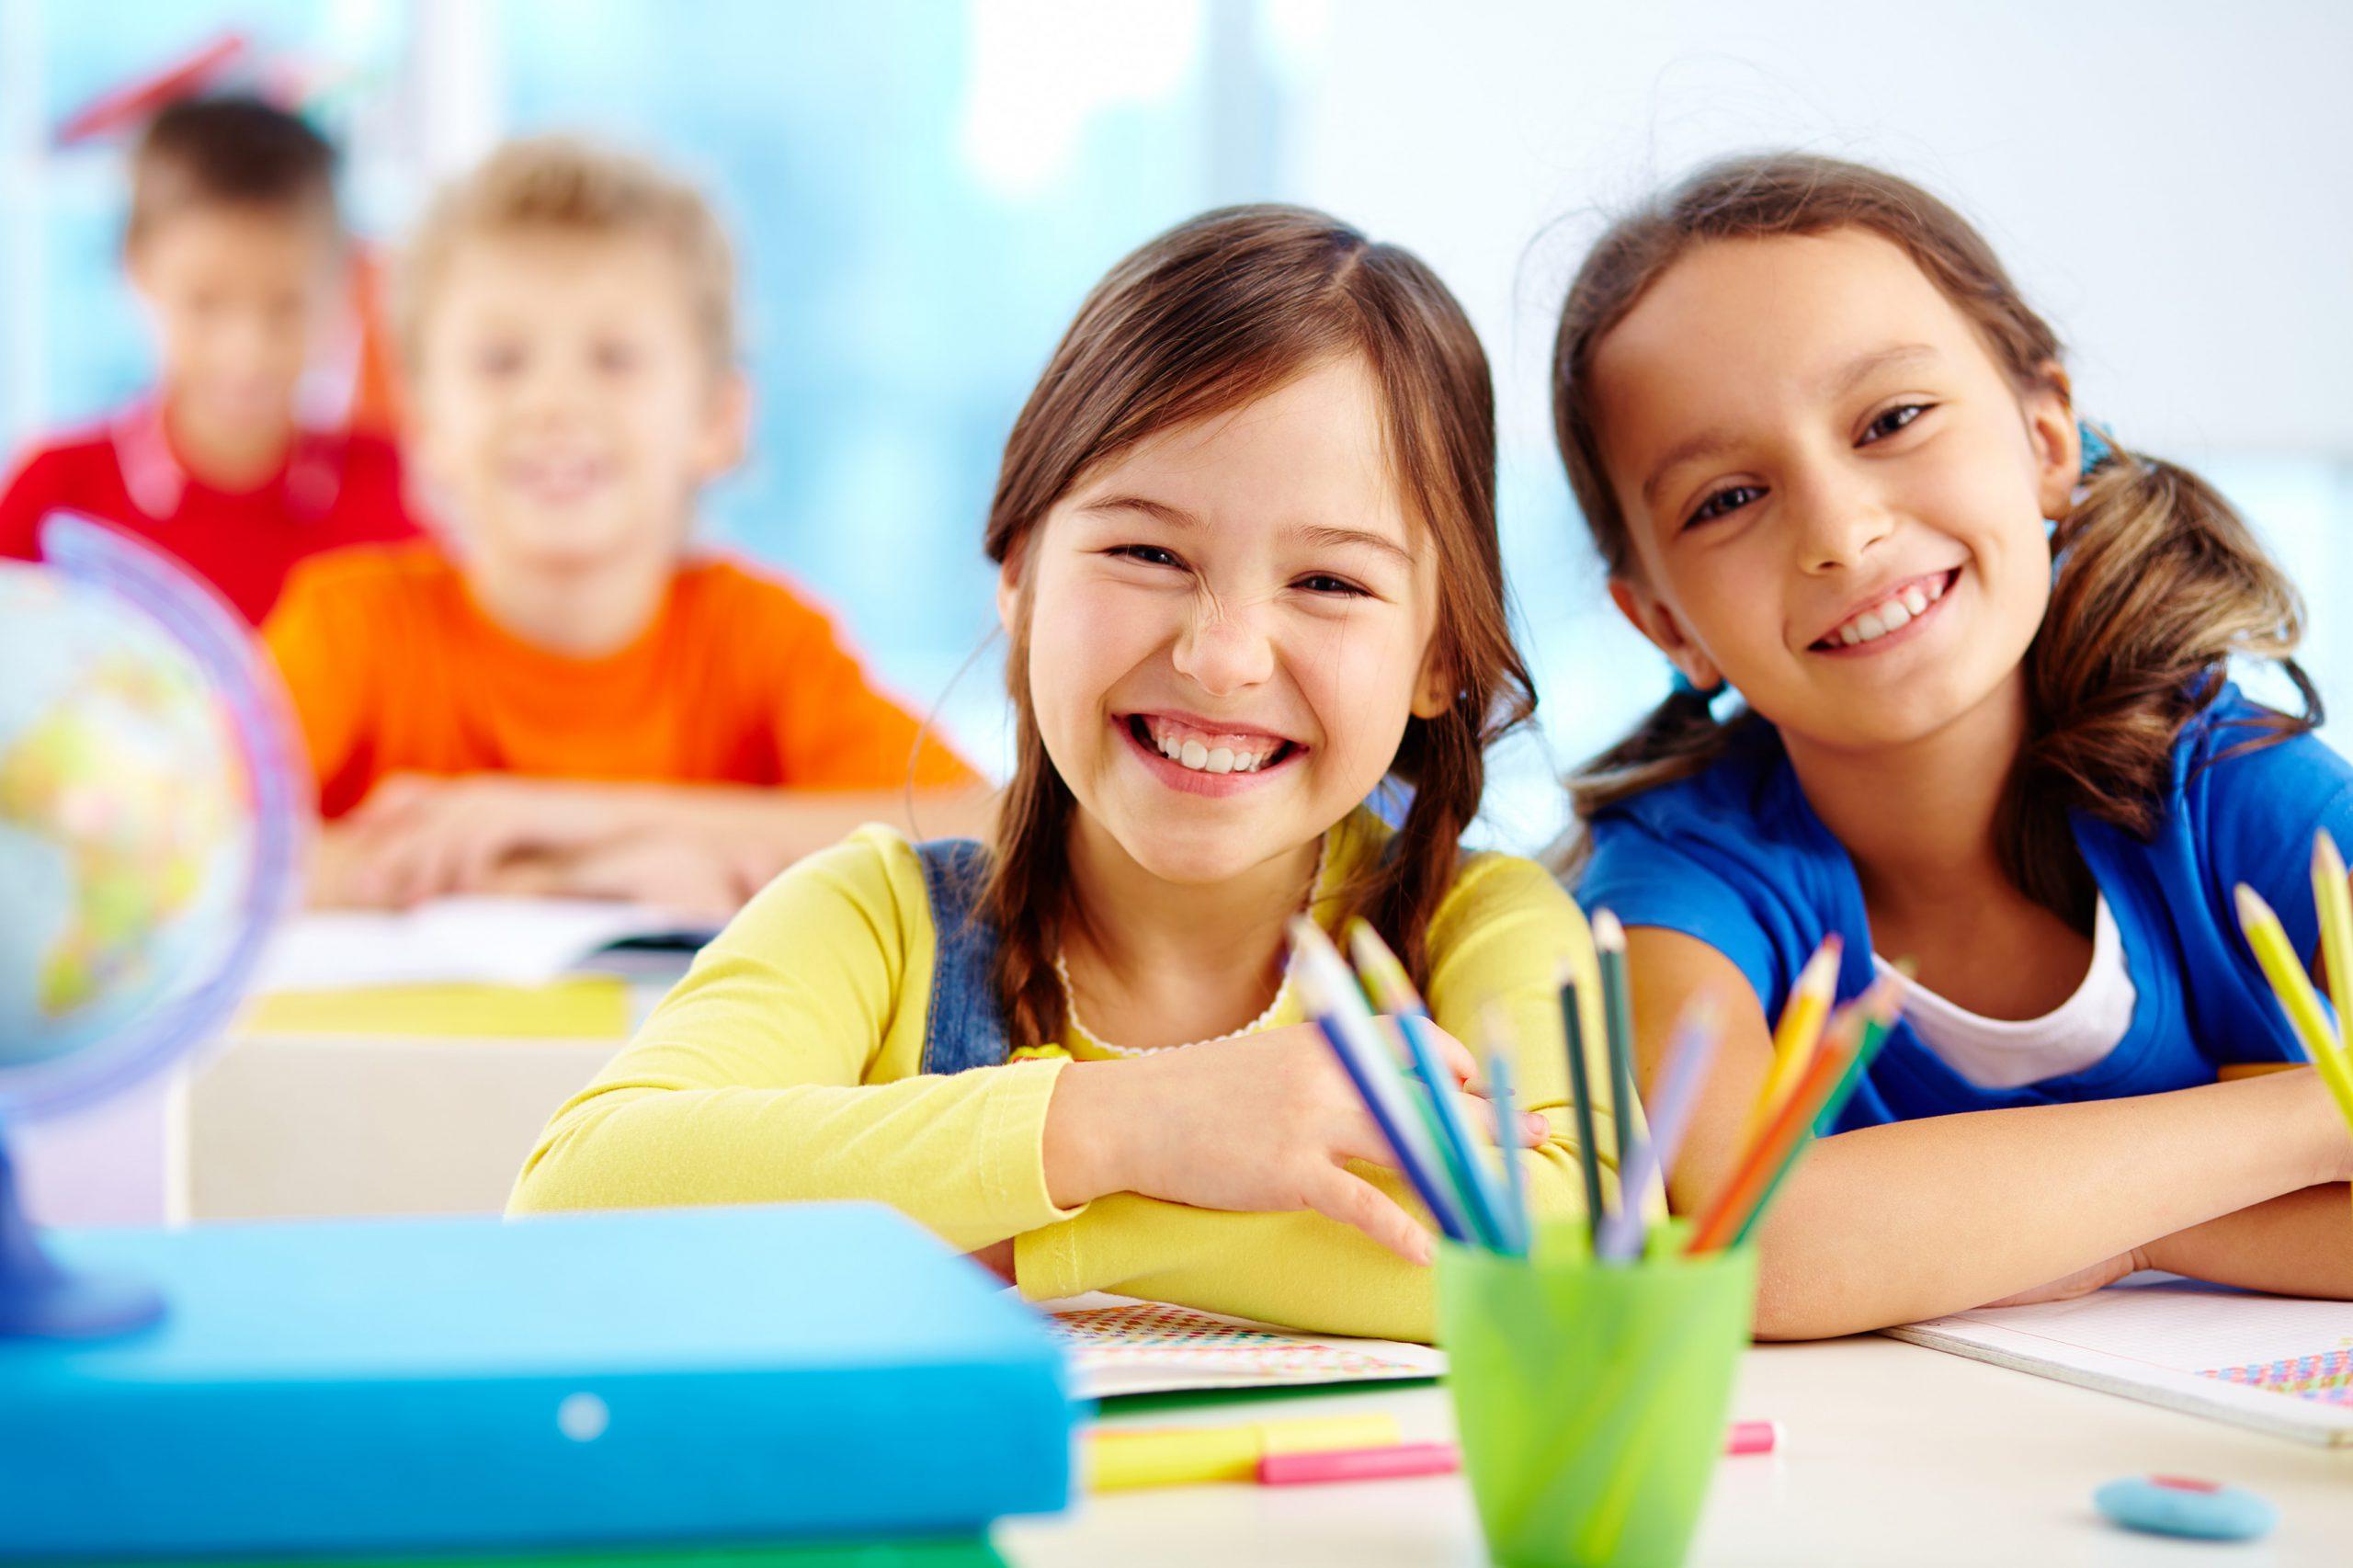 children smiling at school